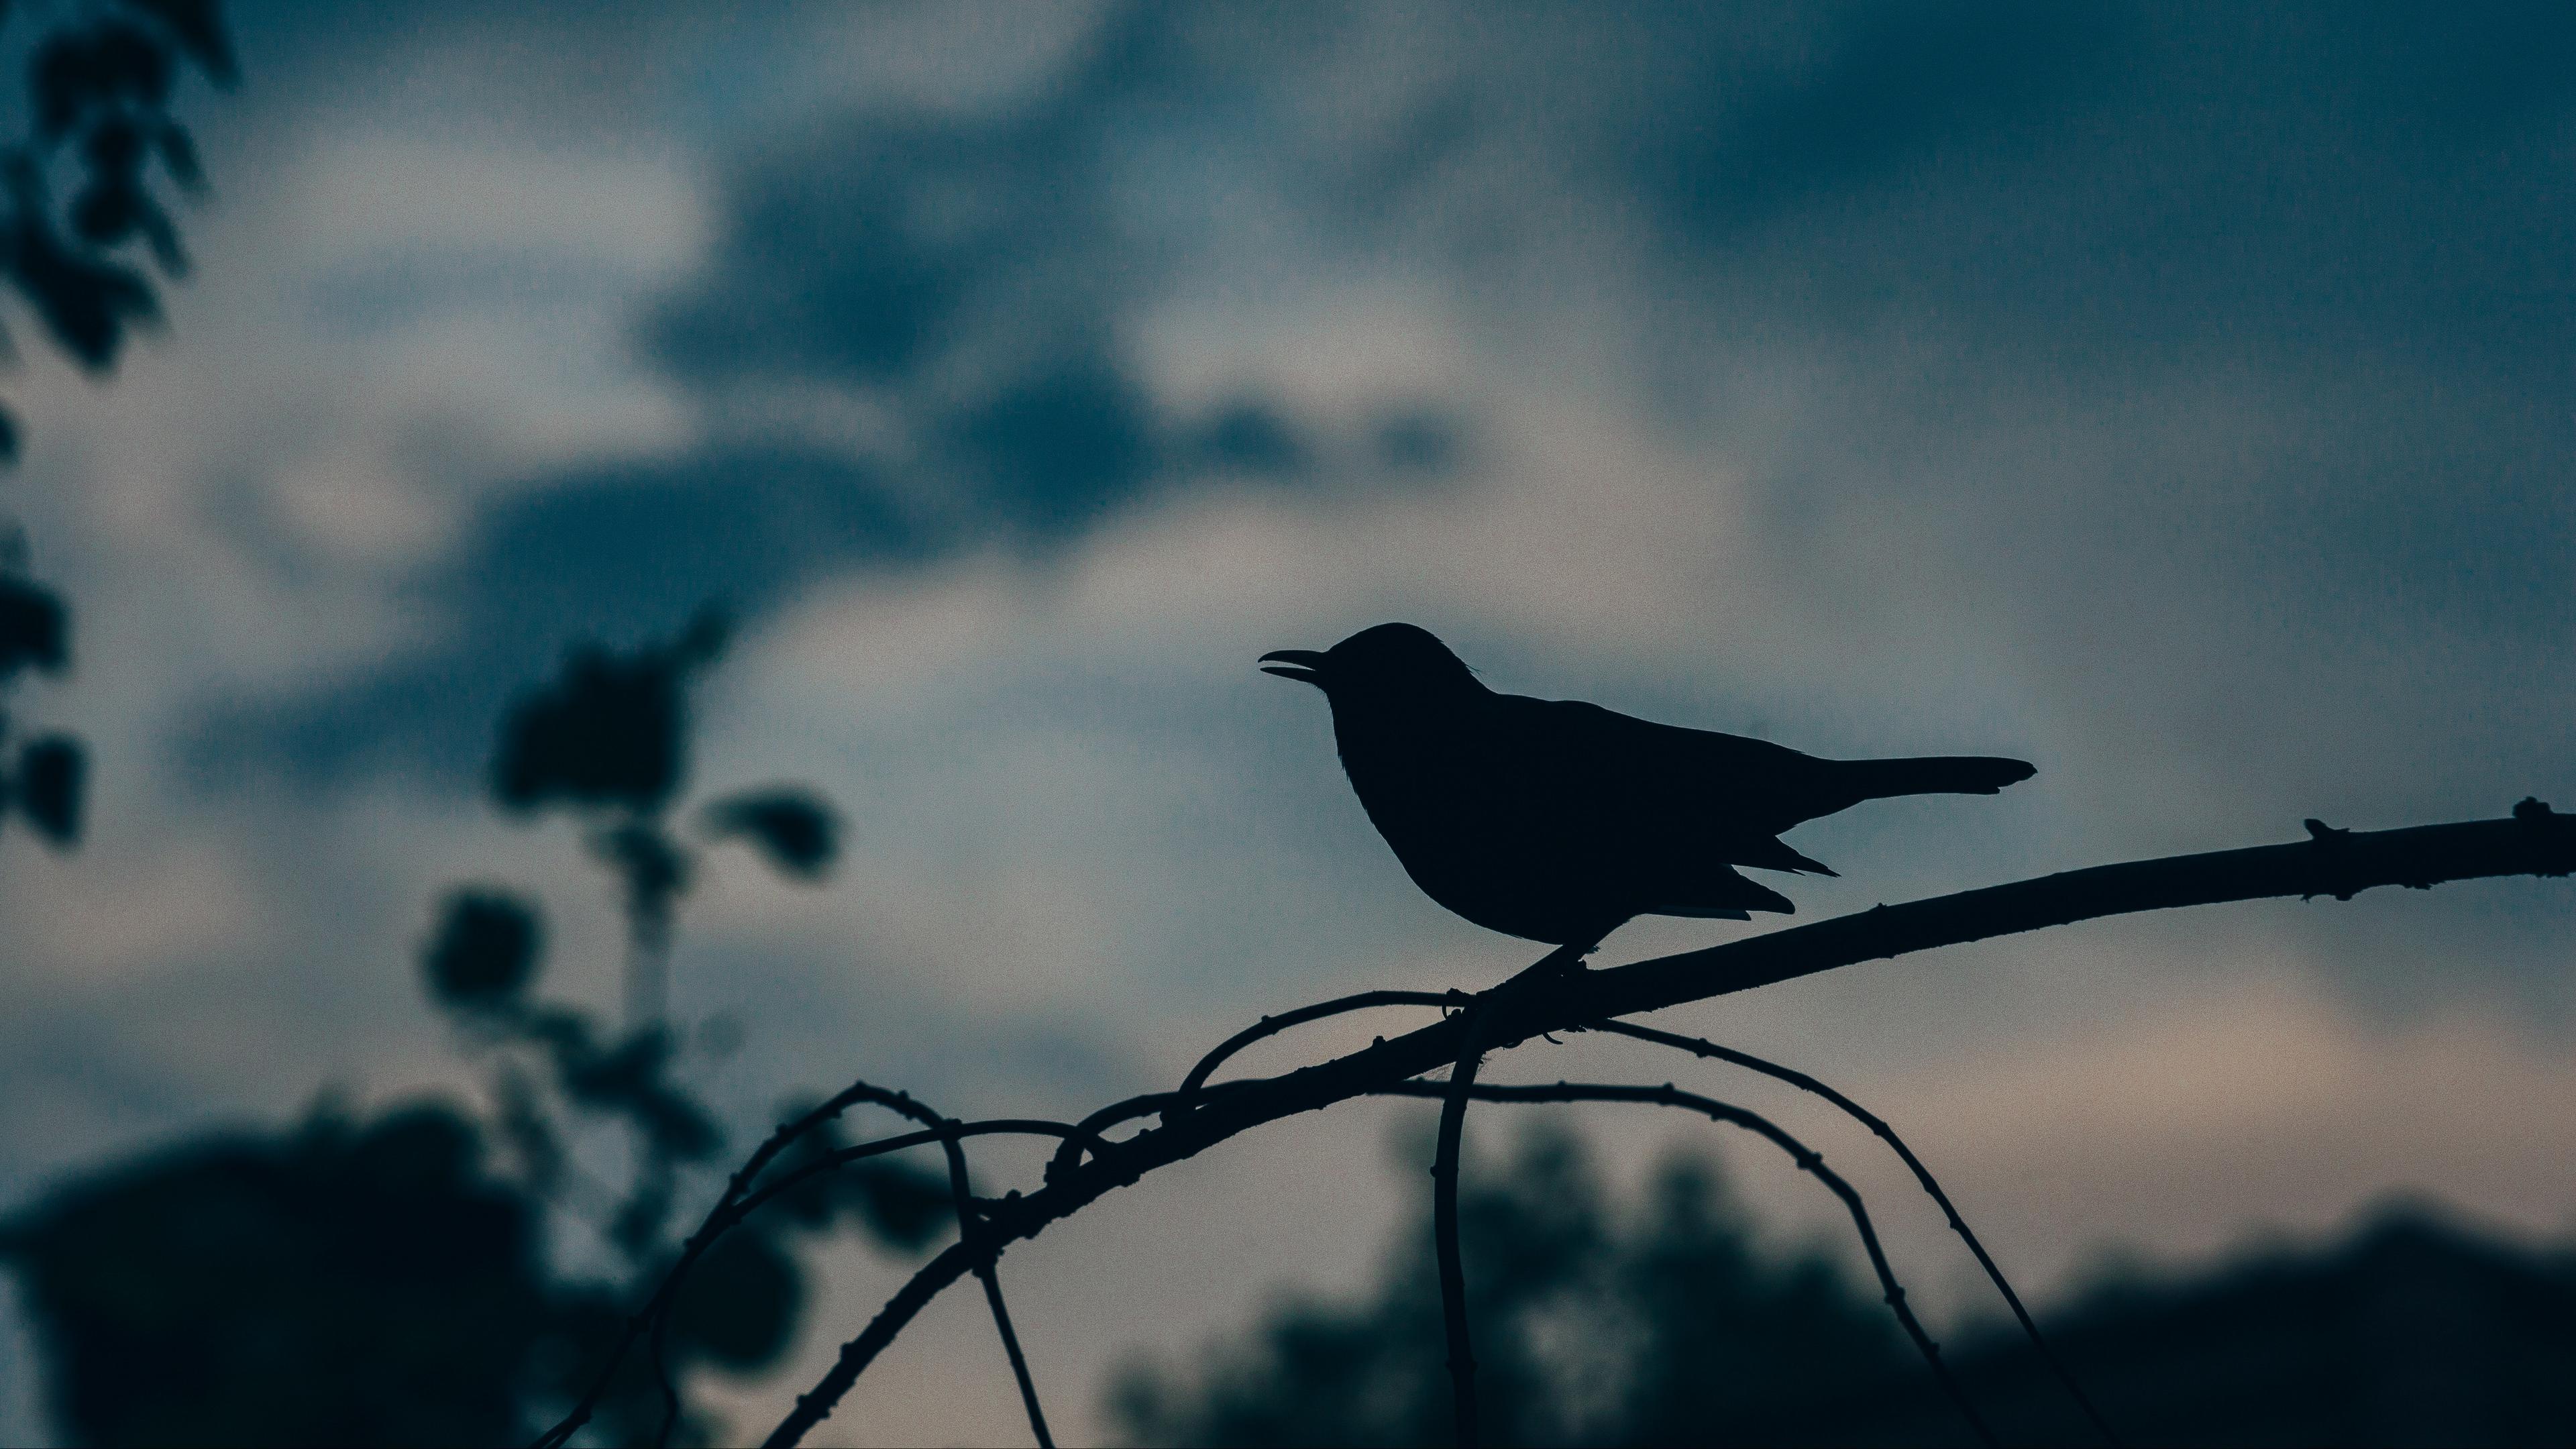 bird silhouette branch 4k 1540576320 - bird, silhouette, branch 4k - Silhouette, branch, Bird